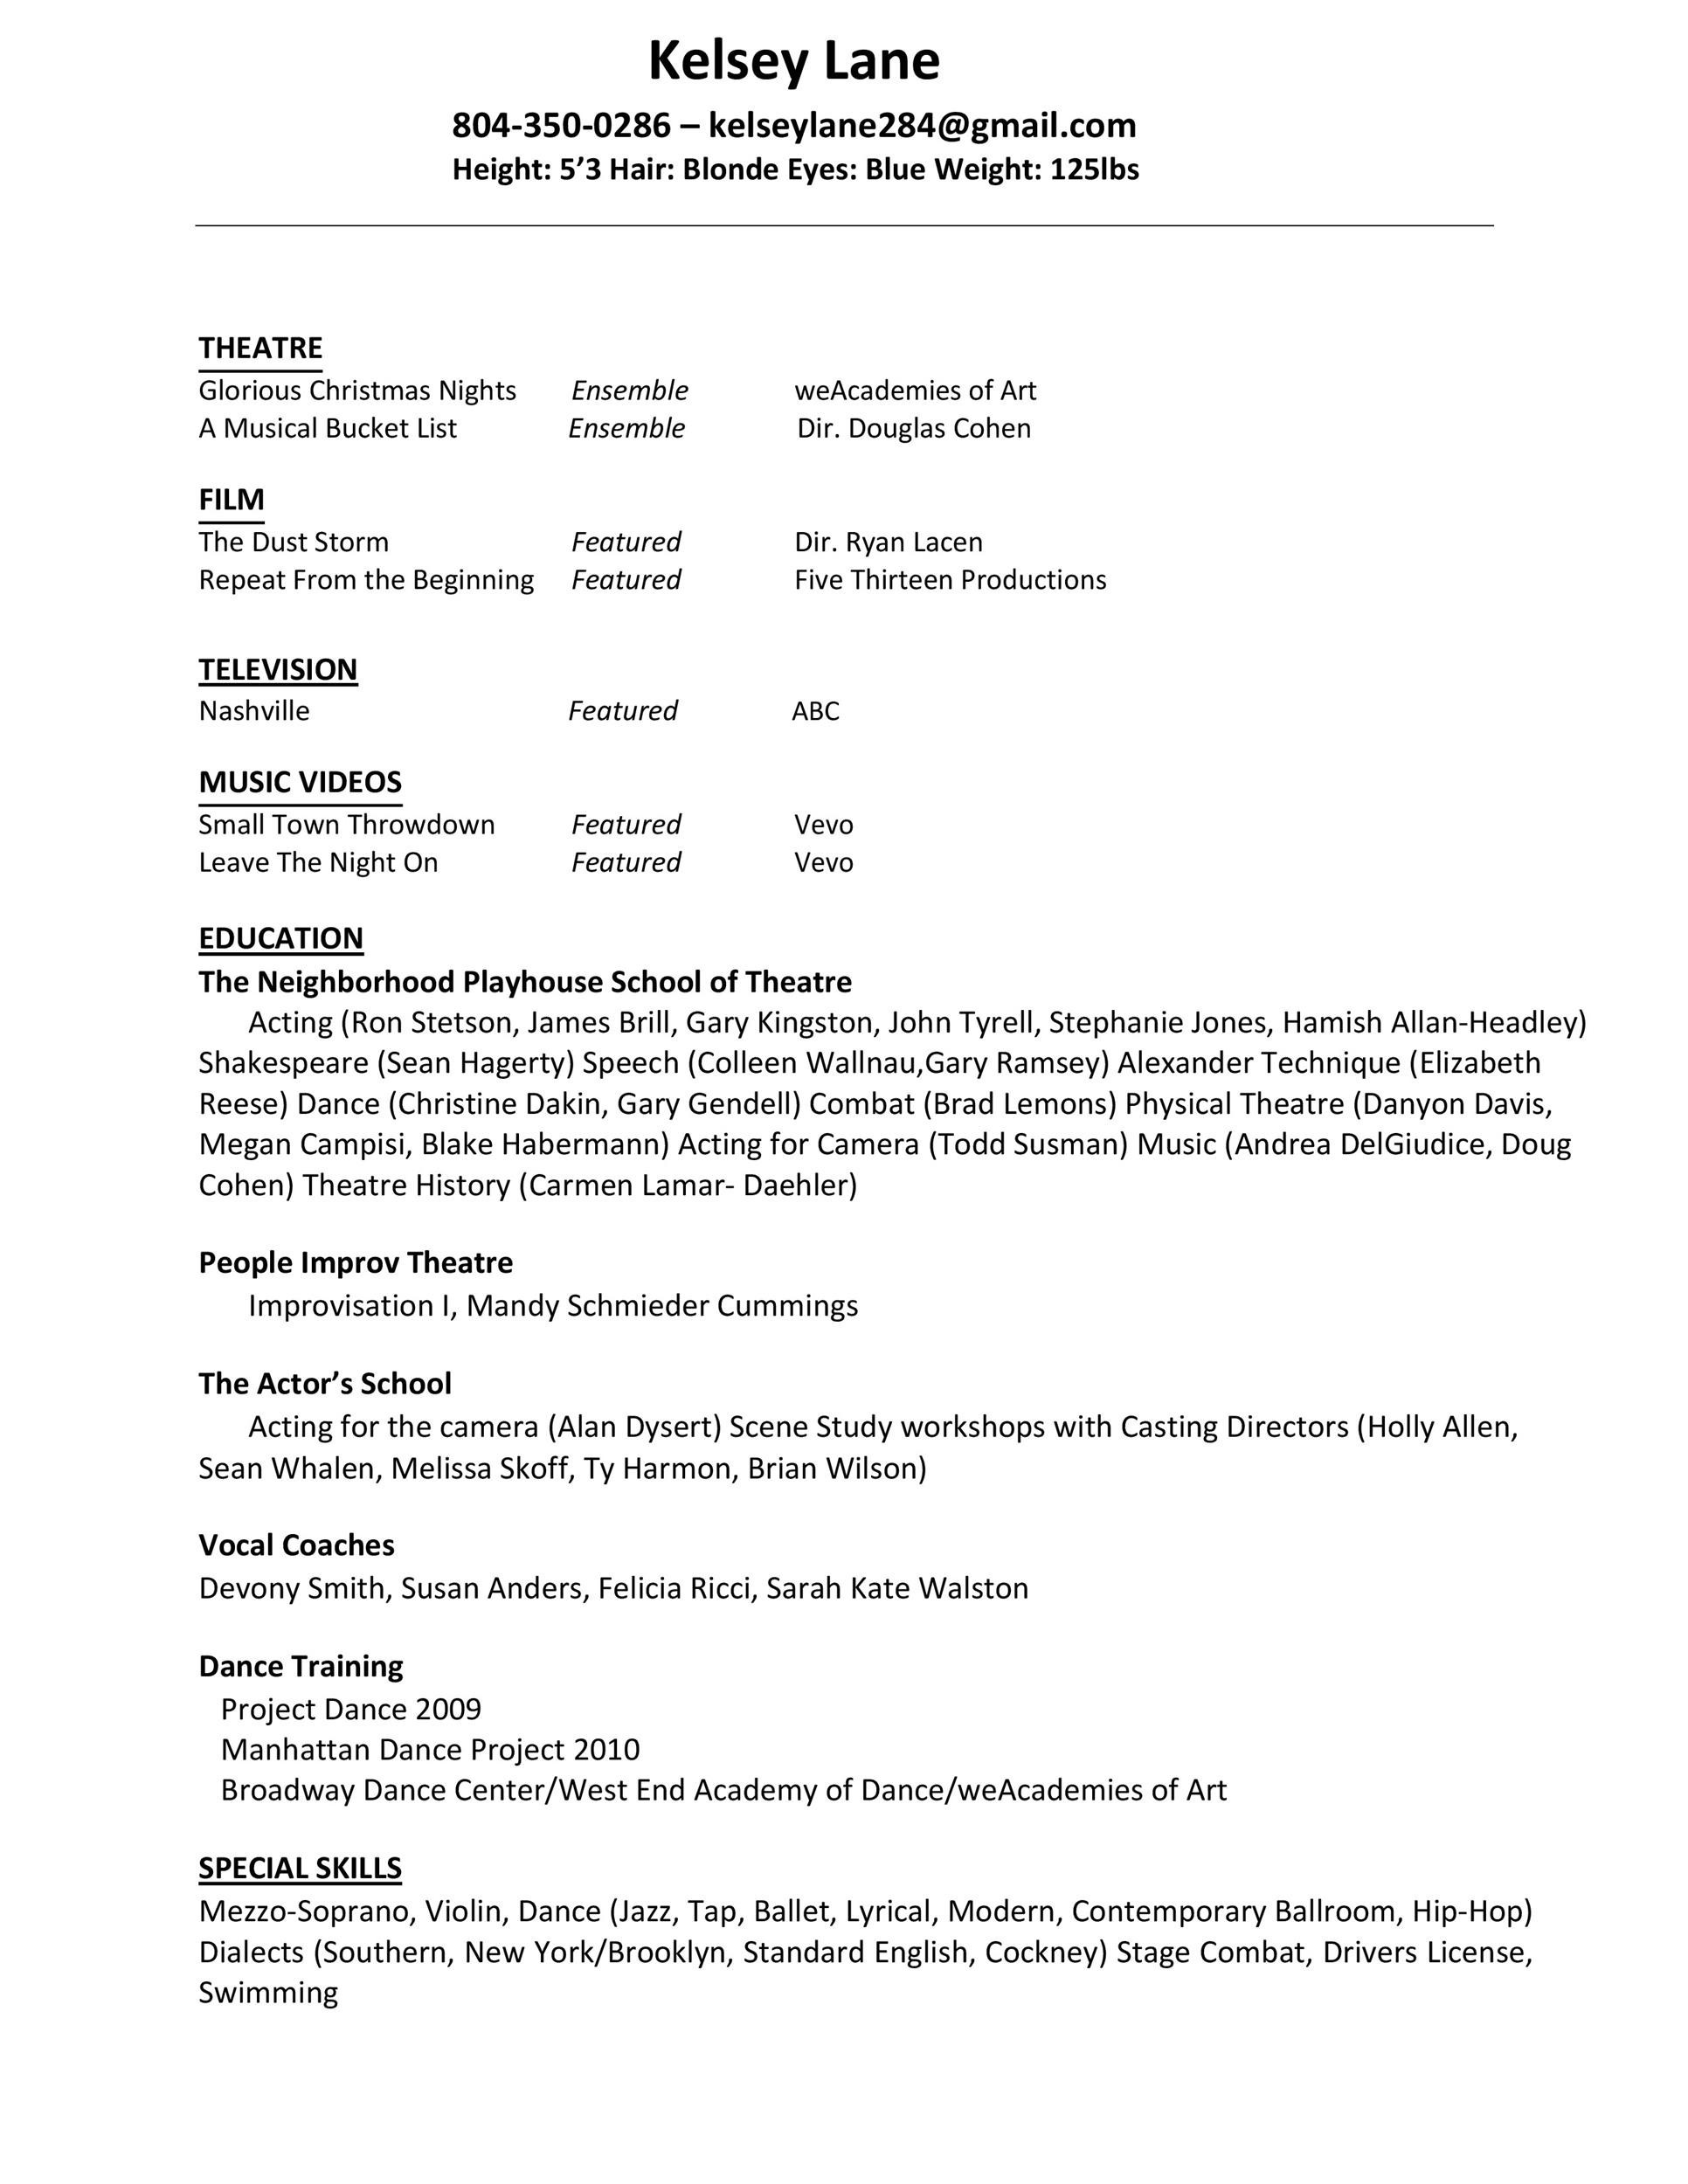 Zip Descargar 50 Free Acting Resume Templates Word Google